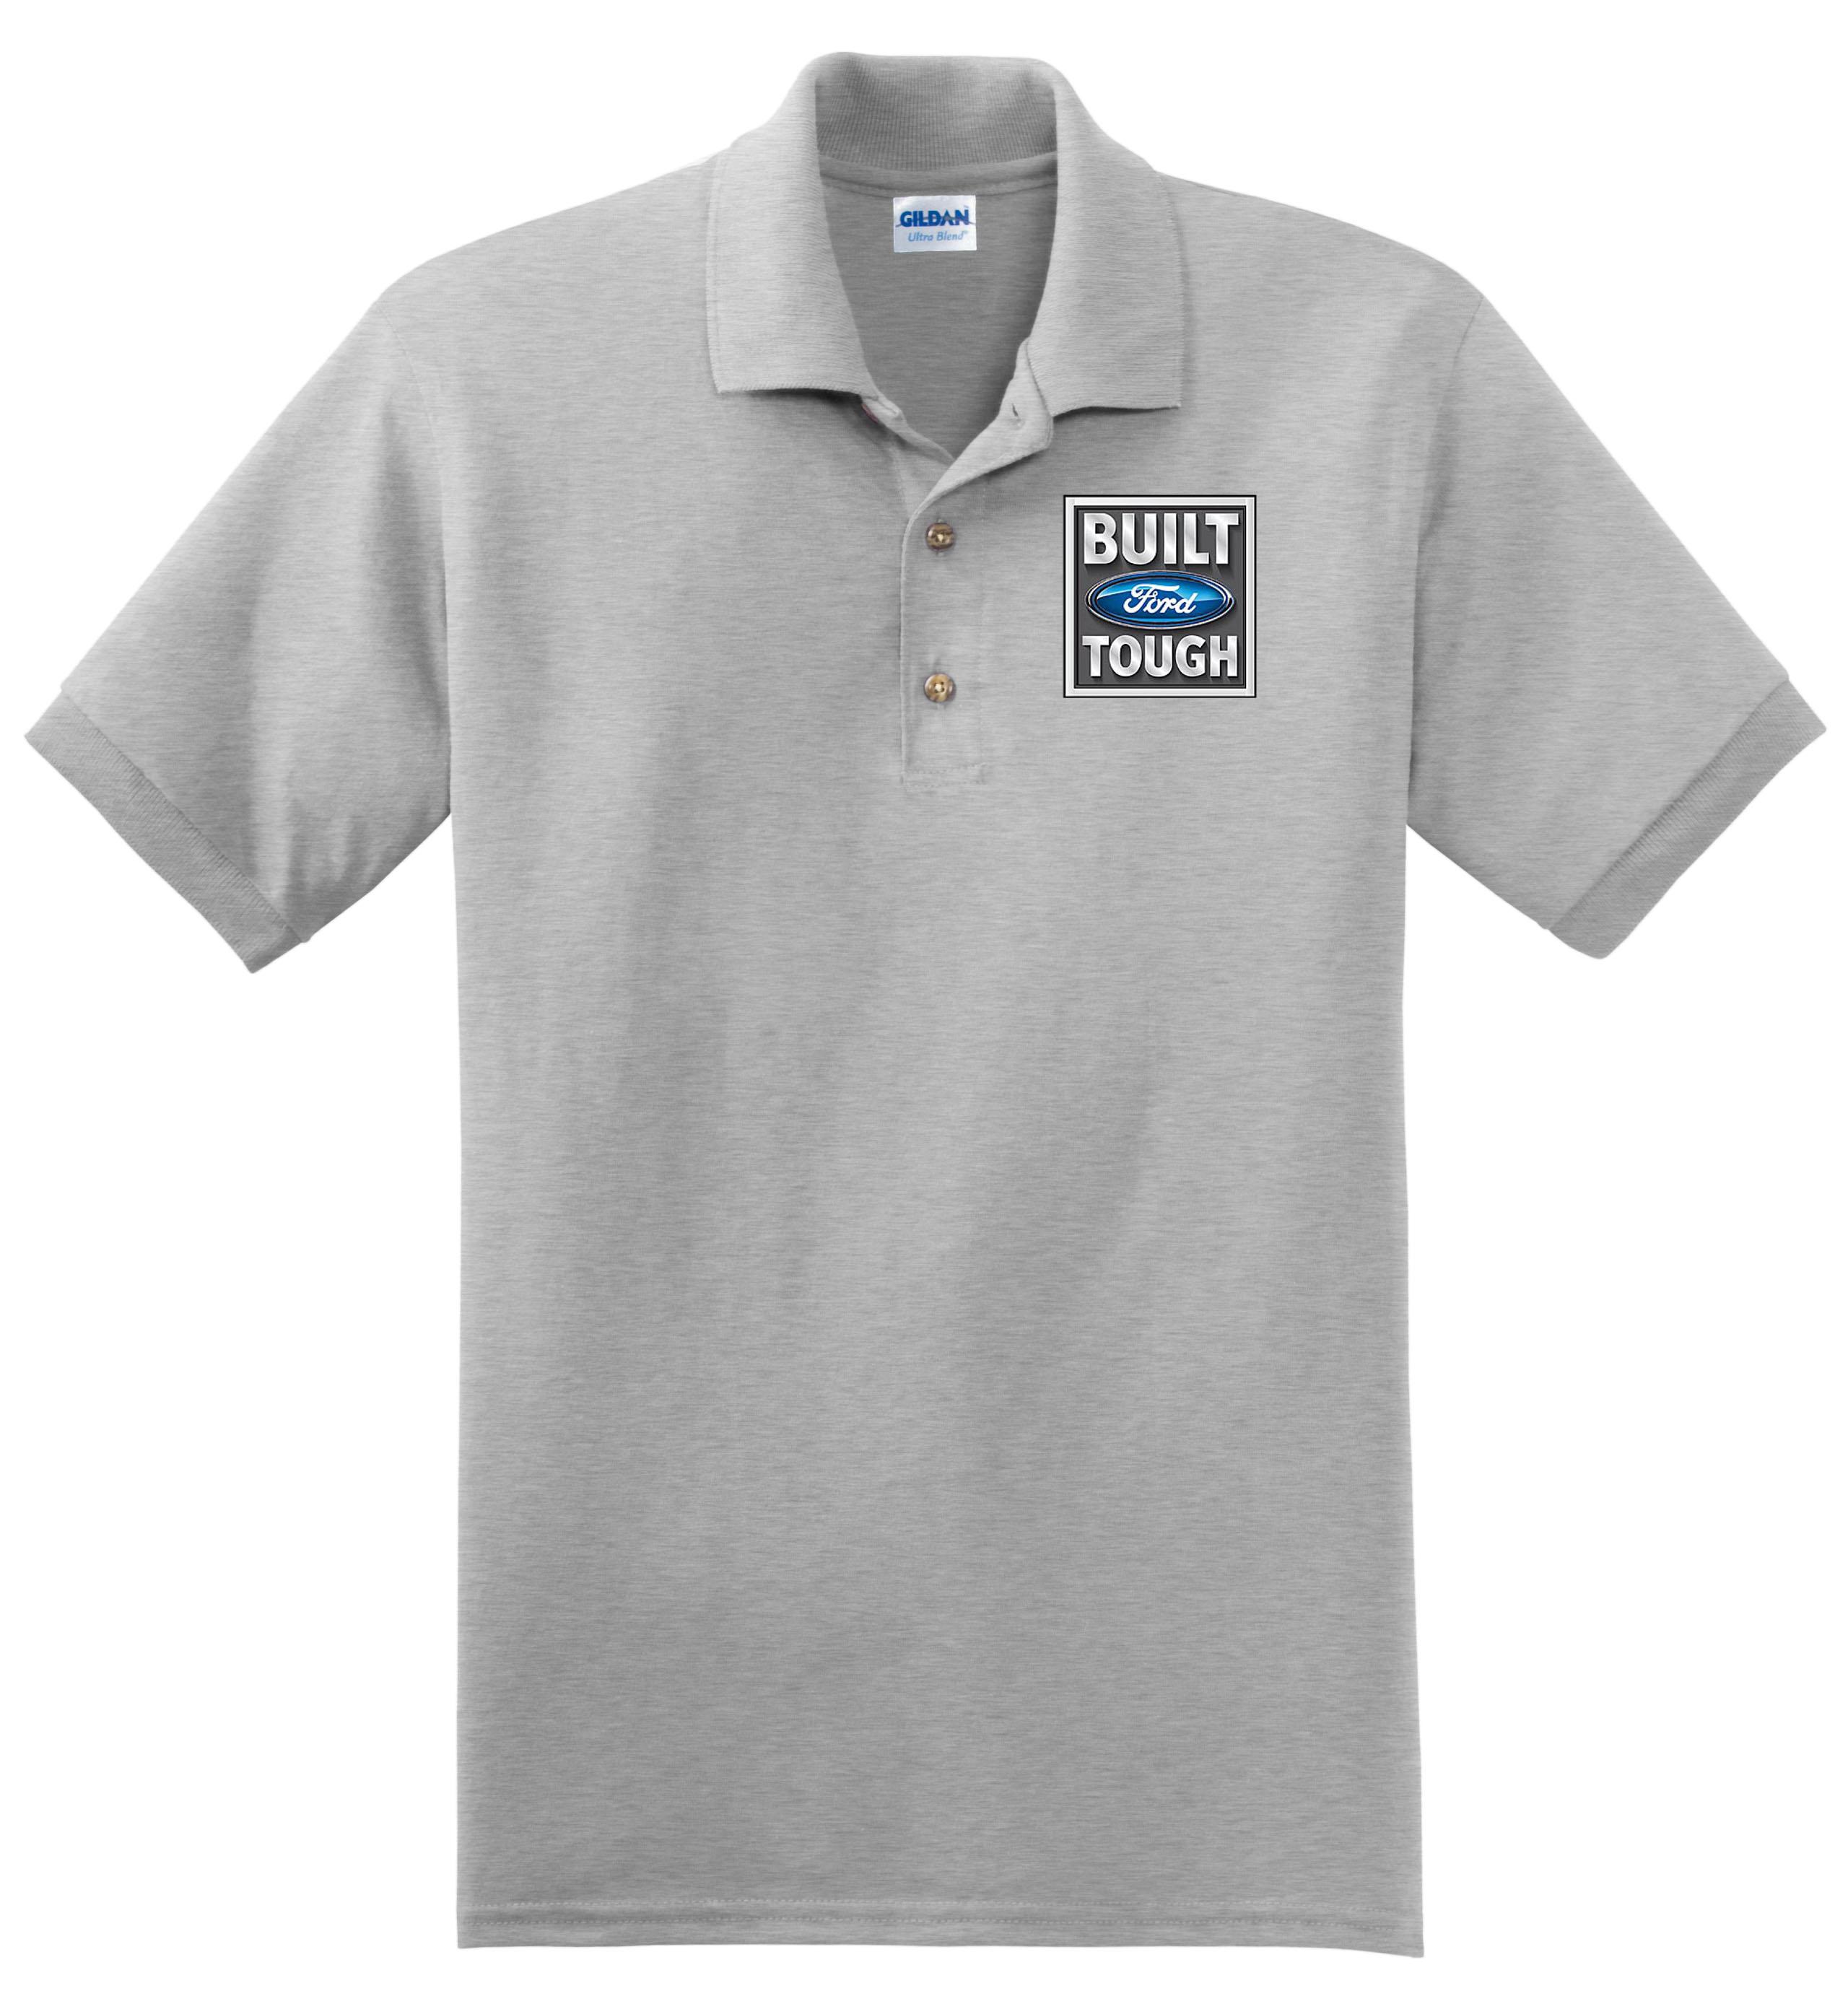 57edf684f Mens Ford Tough Logo Golf Golfing Shirt Polo Employee Tee S-XXXL | eBay